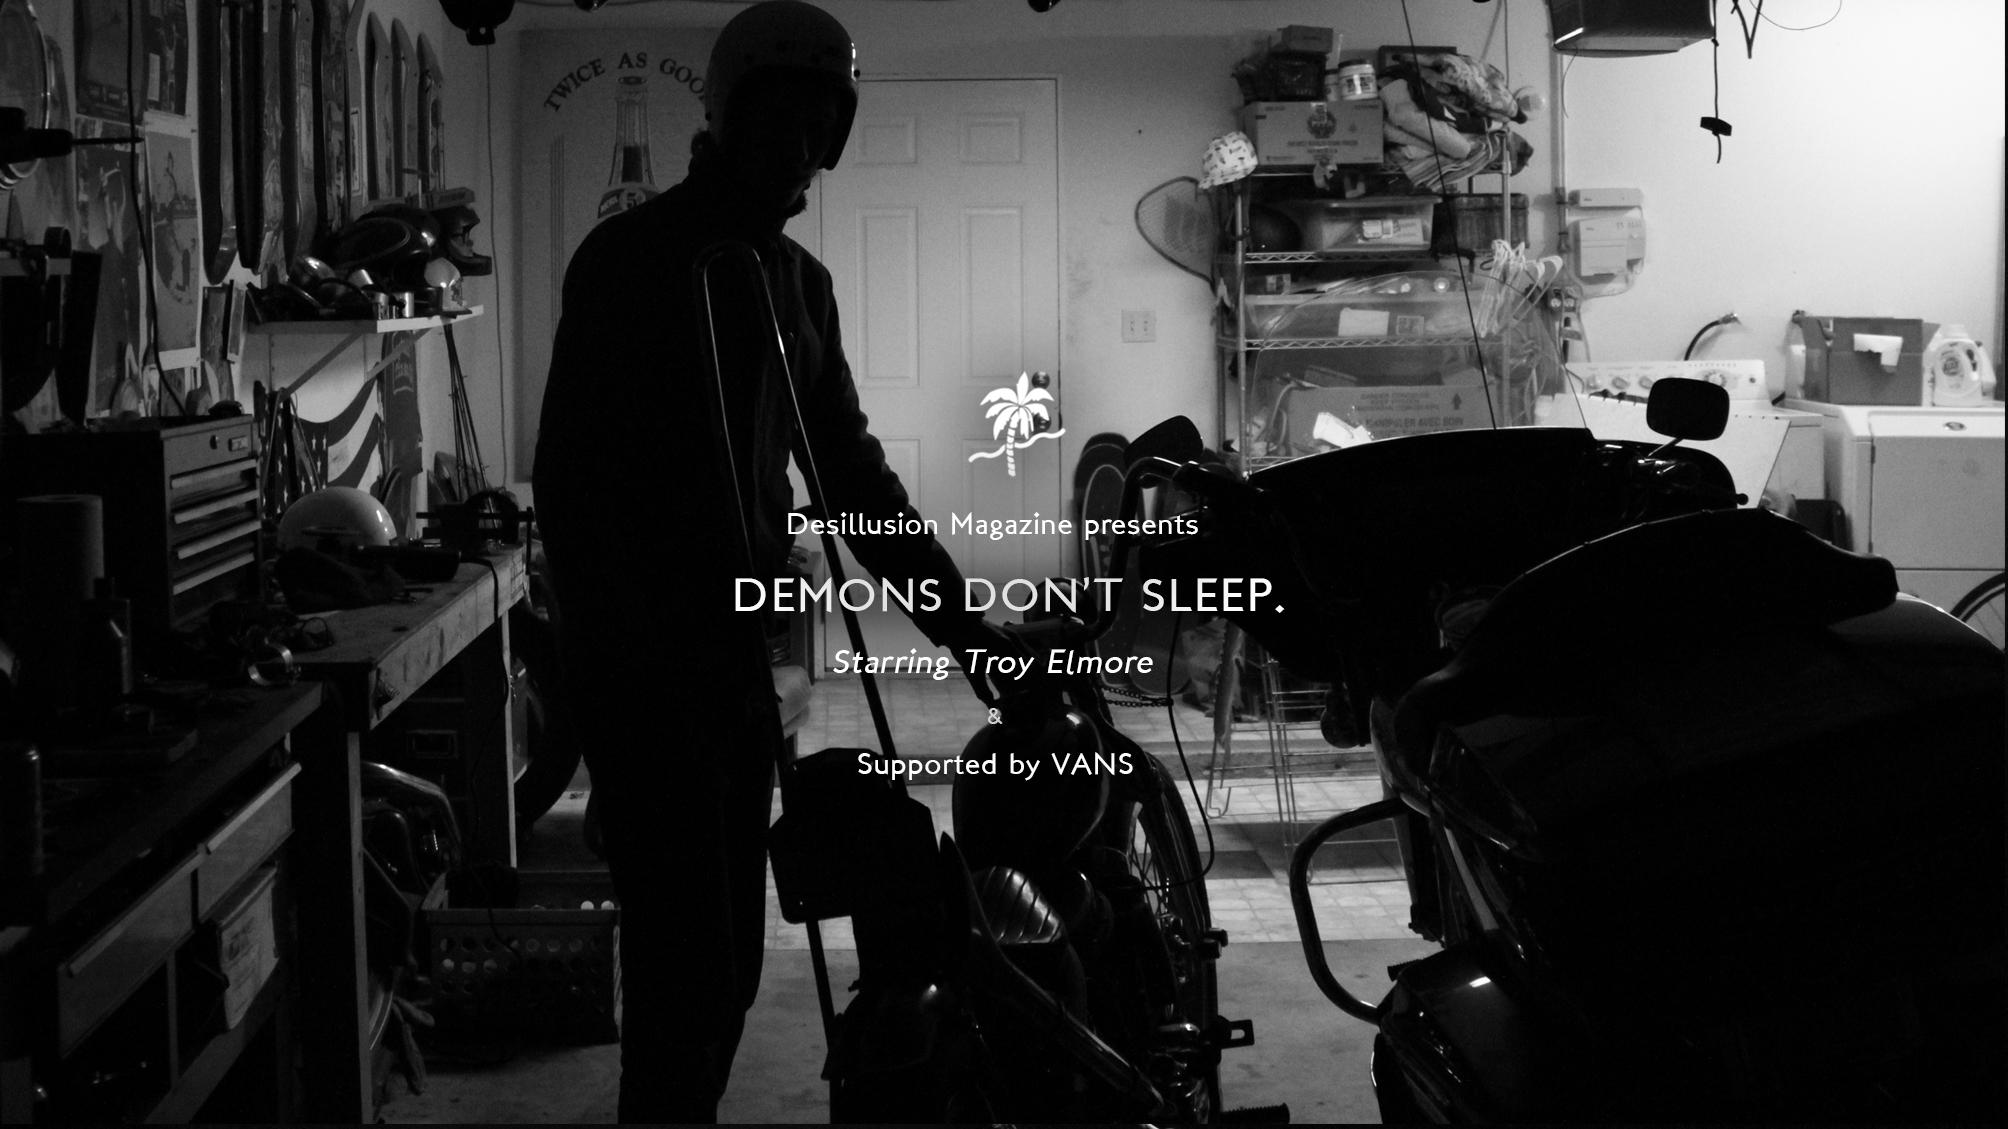 Demons Don't Sleep